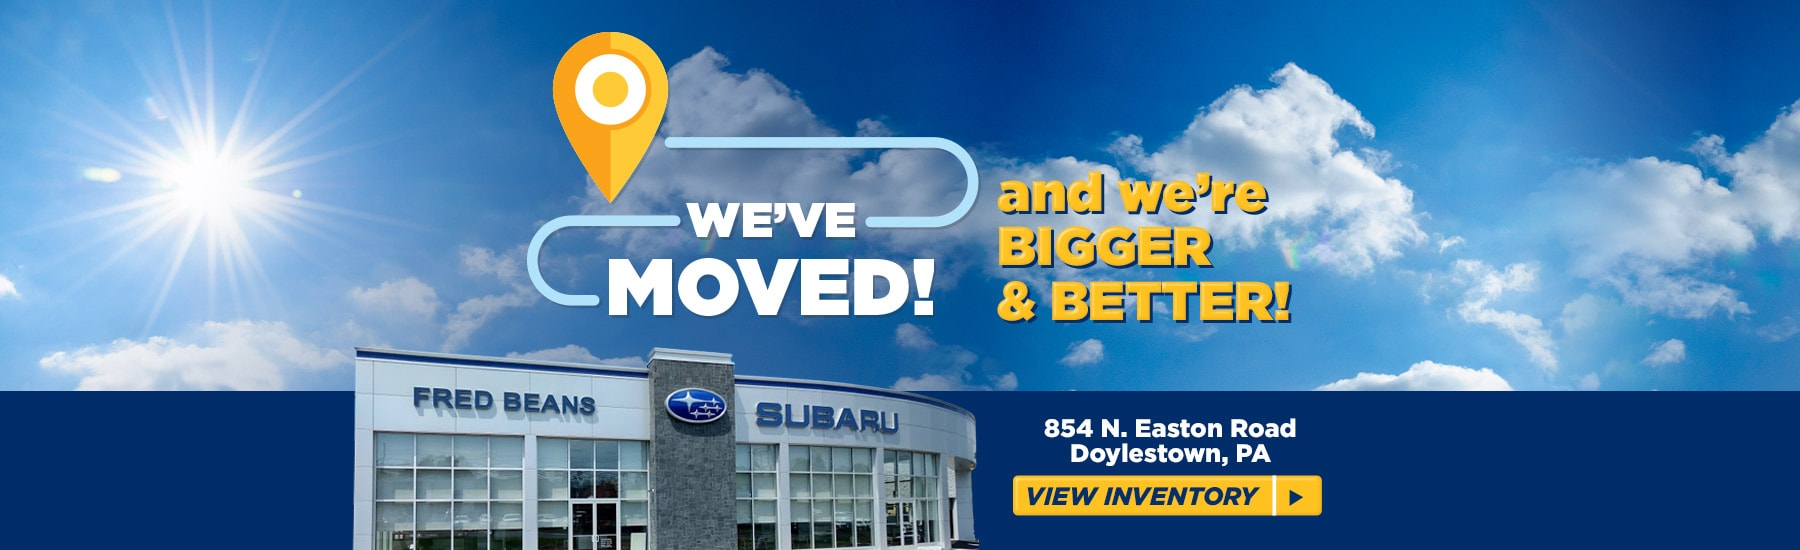 Fred Beans Subaru >> Subaru Dealership Doylestown PA | Fred Beans Subaru